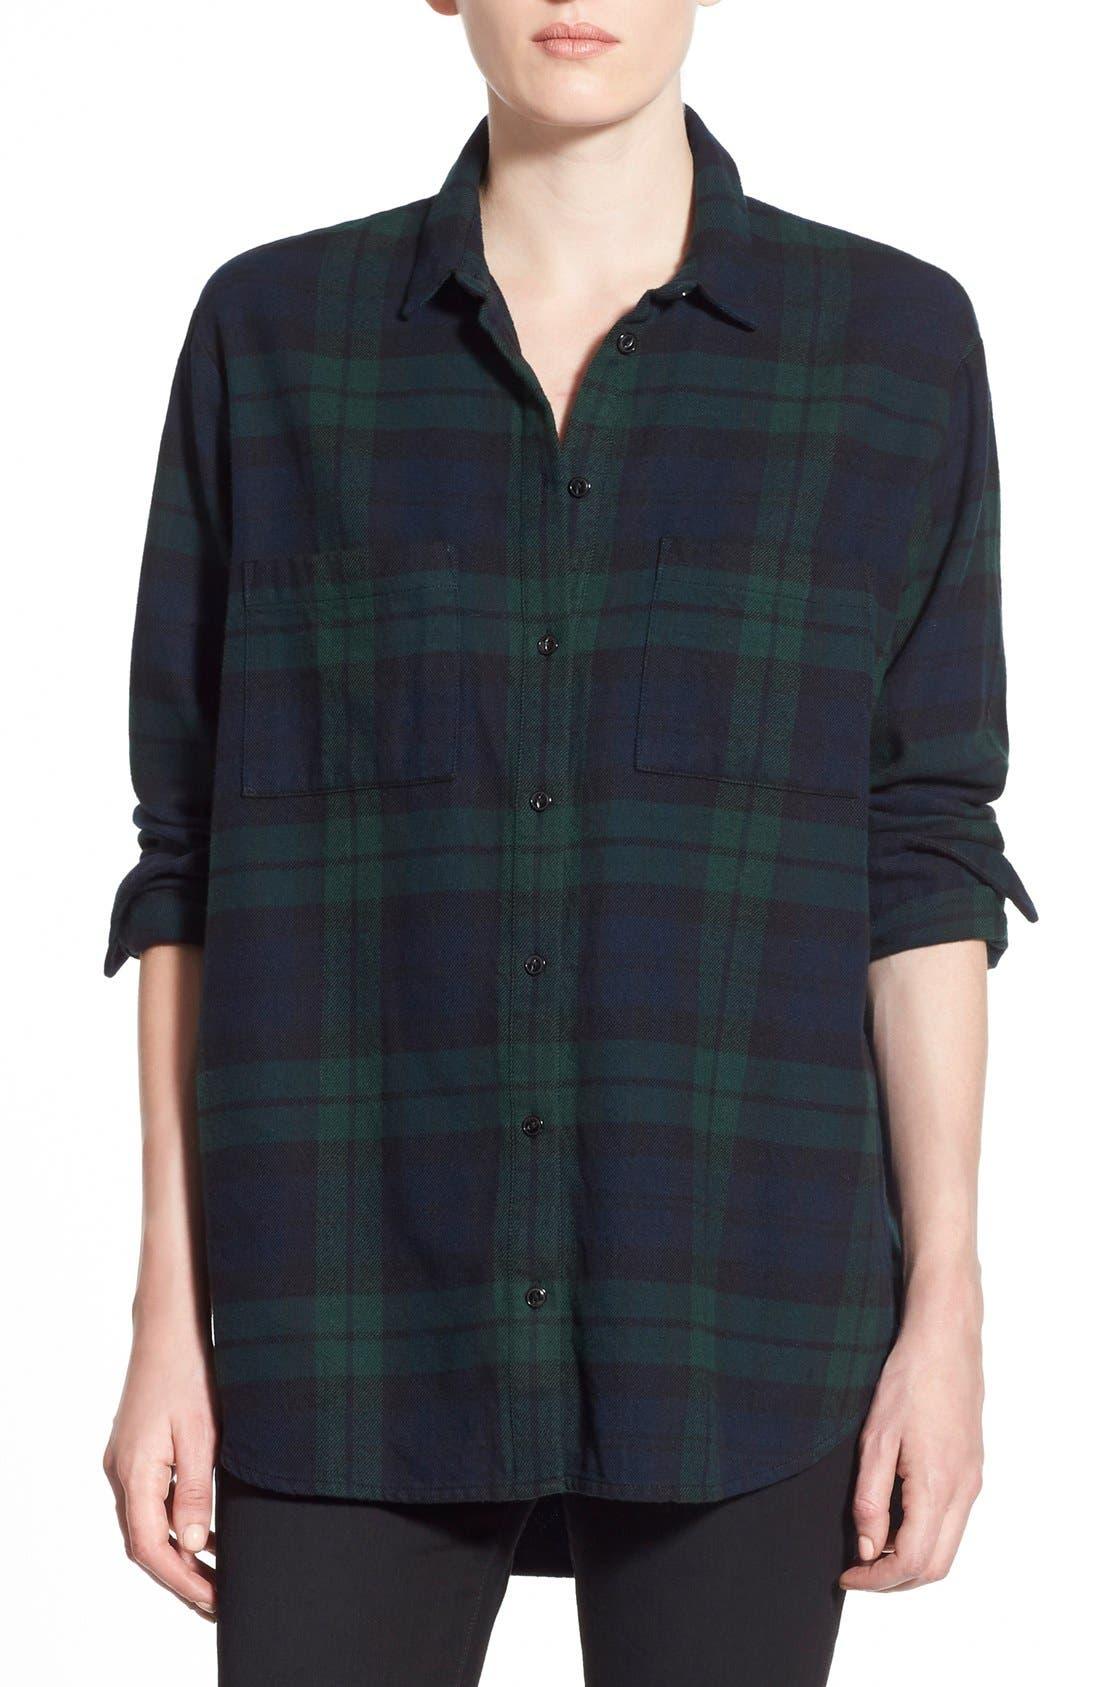 Alternate Image 1 Selected - Madewell Plaid Oversize Cotton Shirt